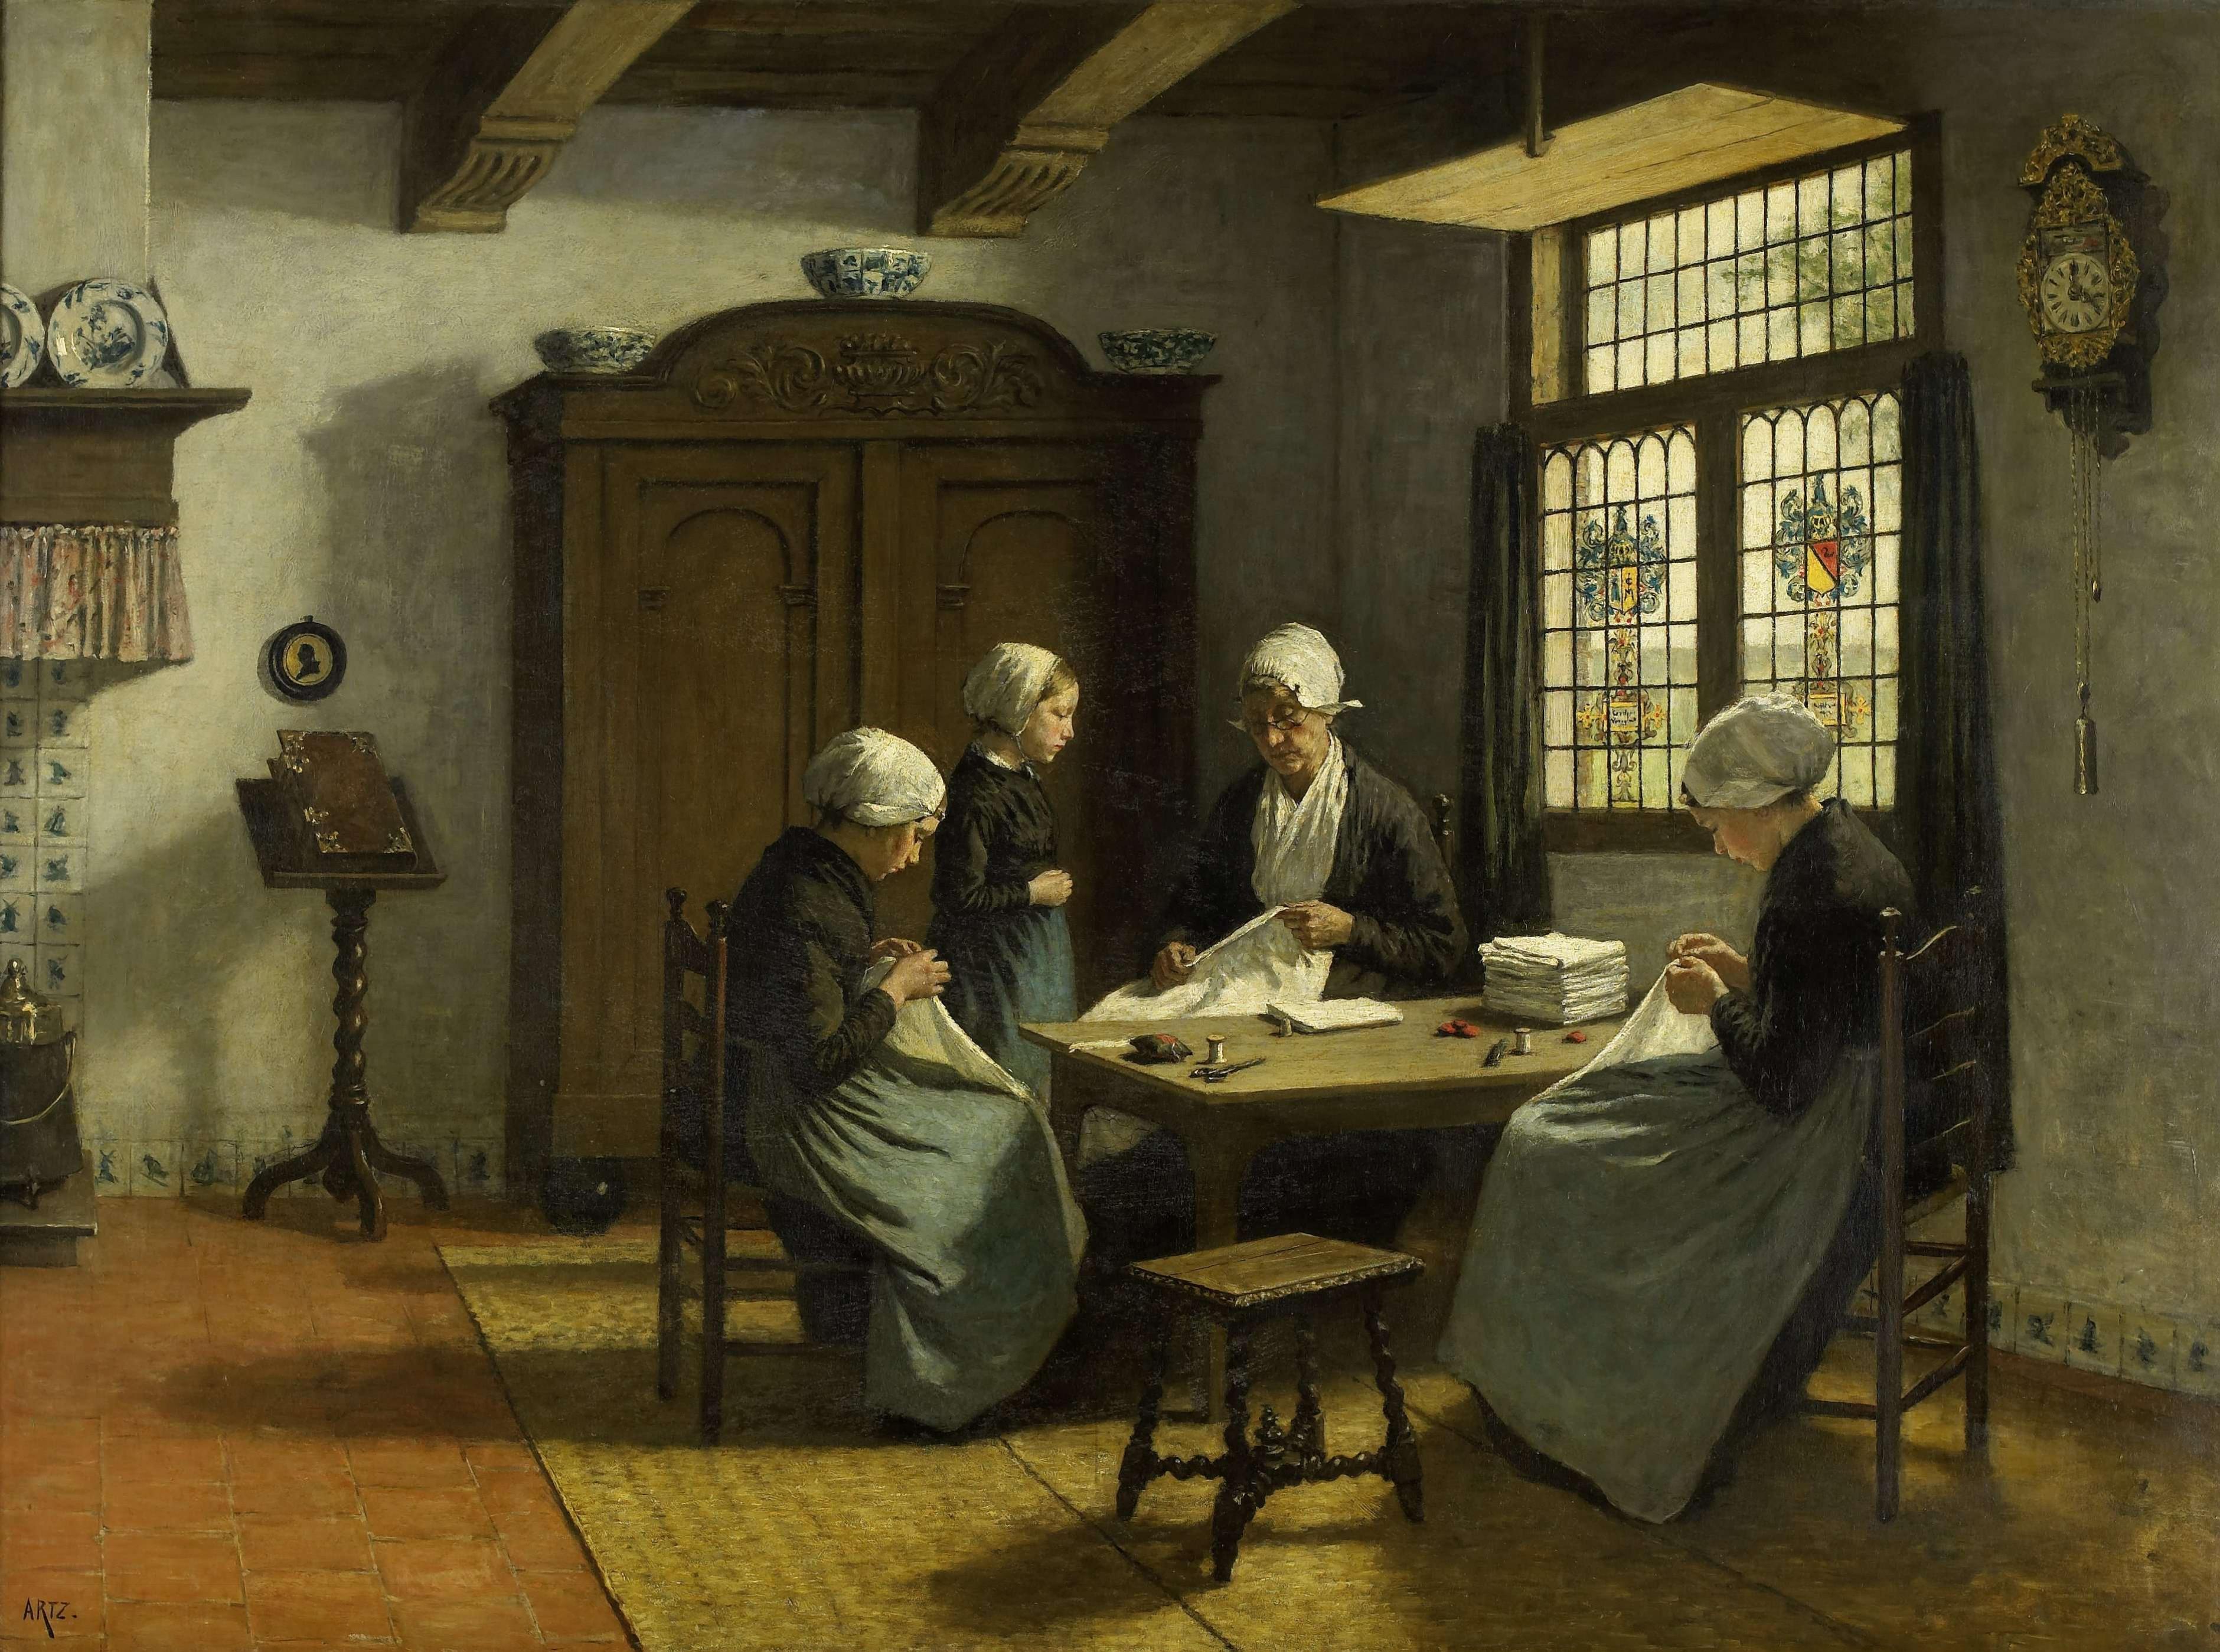 Künstler Maler Az david maler